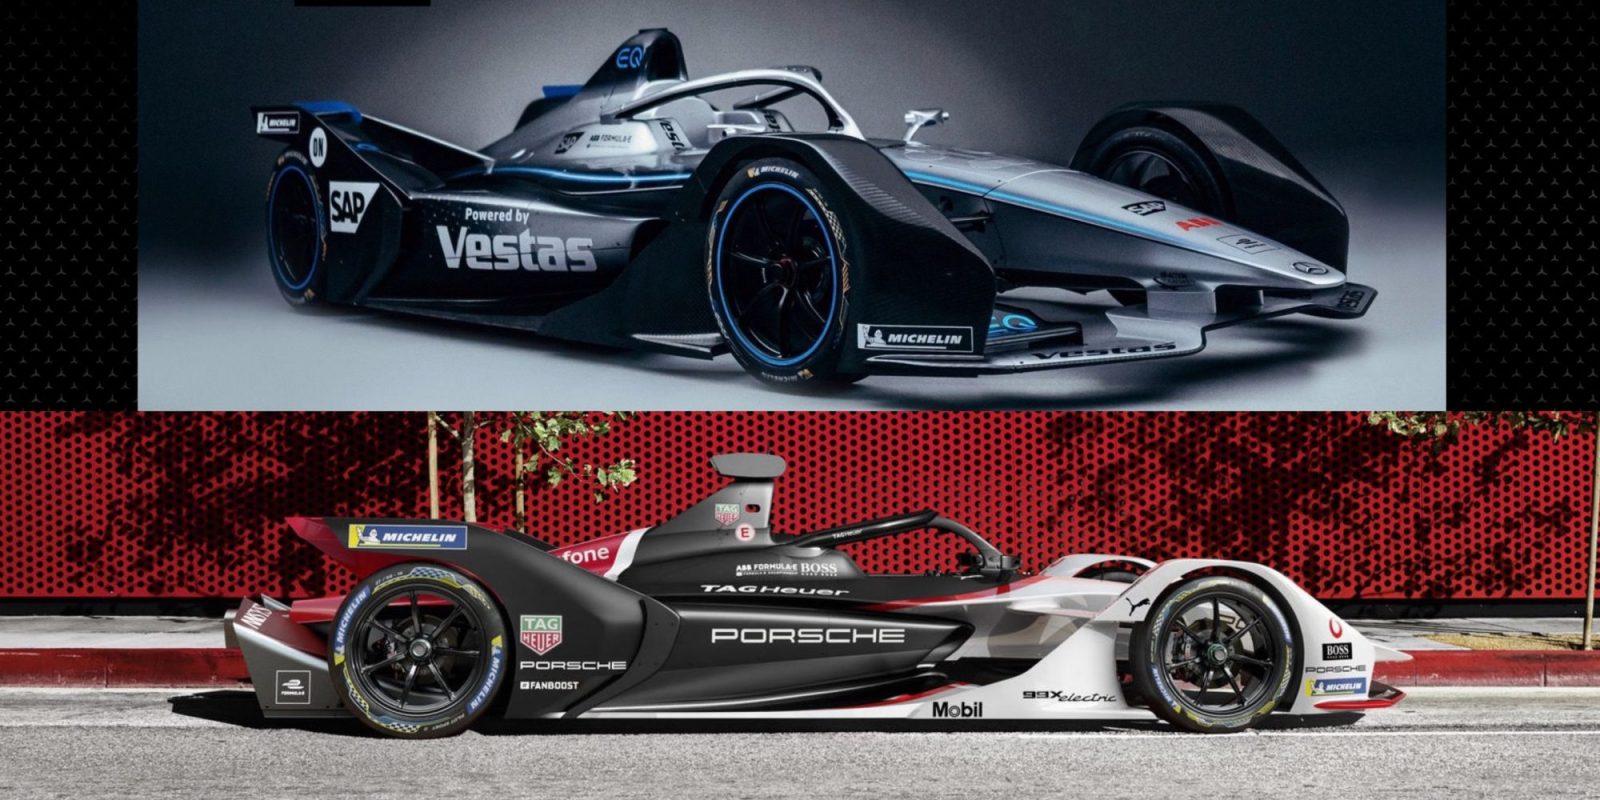 Formula E's 2019-20 season starts Friday, with new Porsche and Mercedes teams